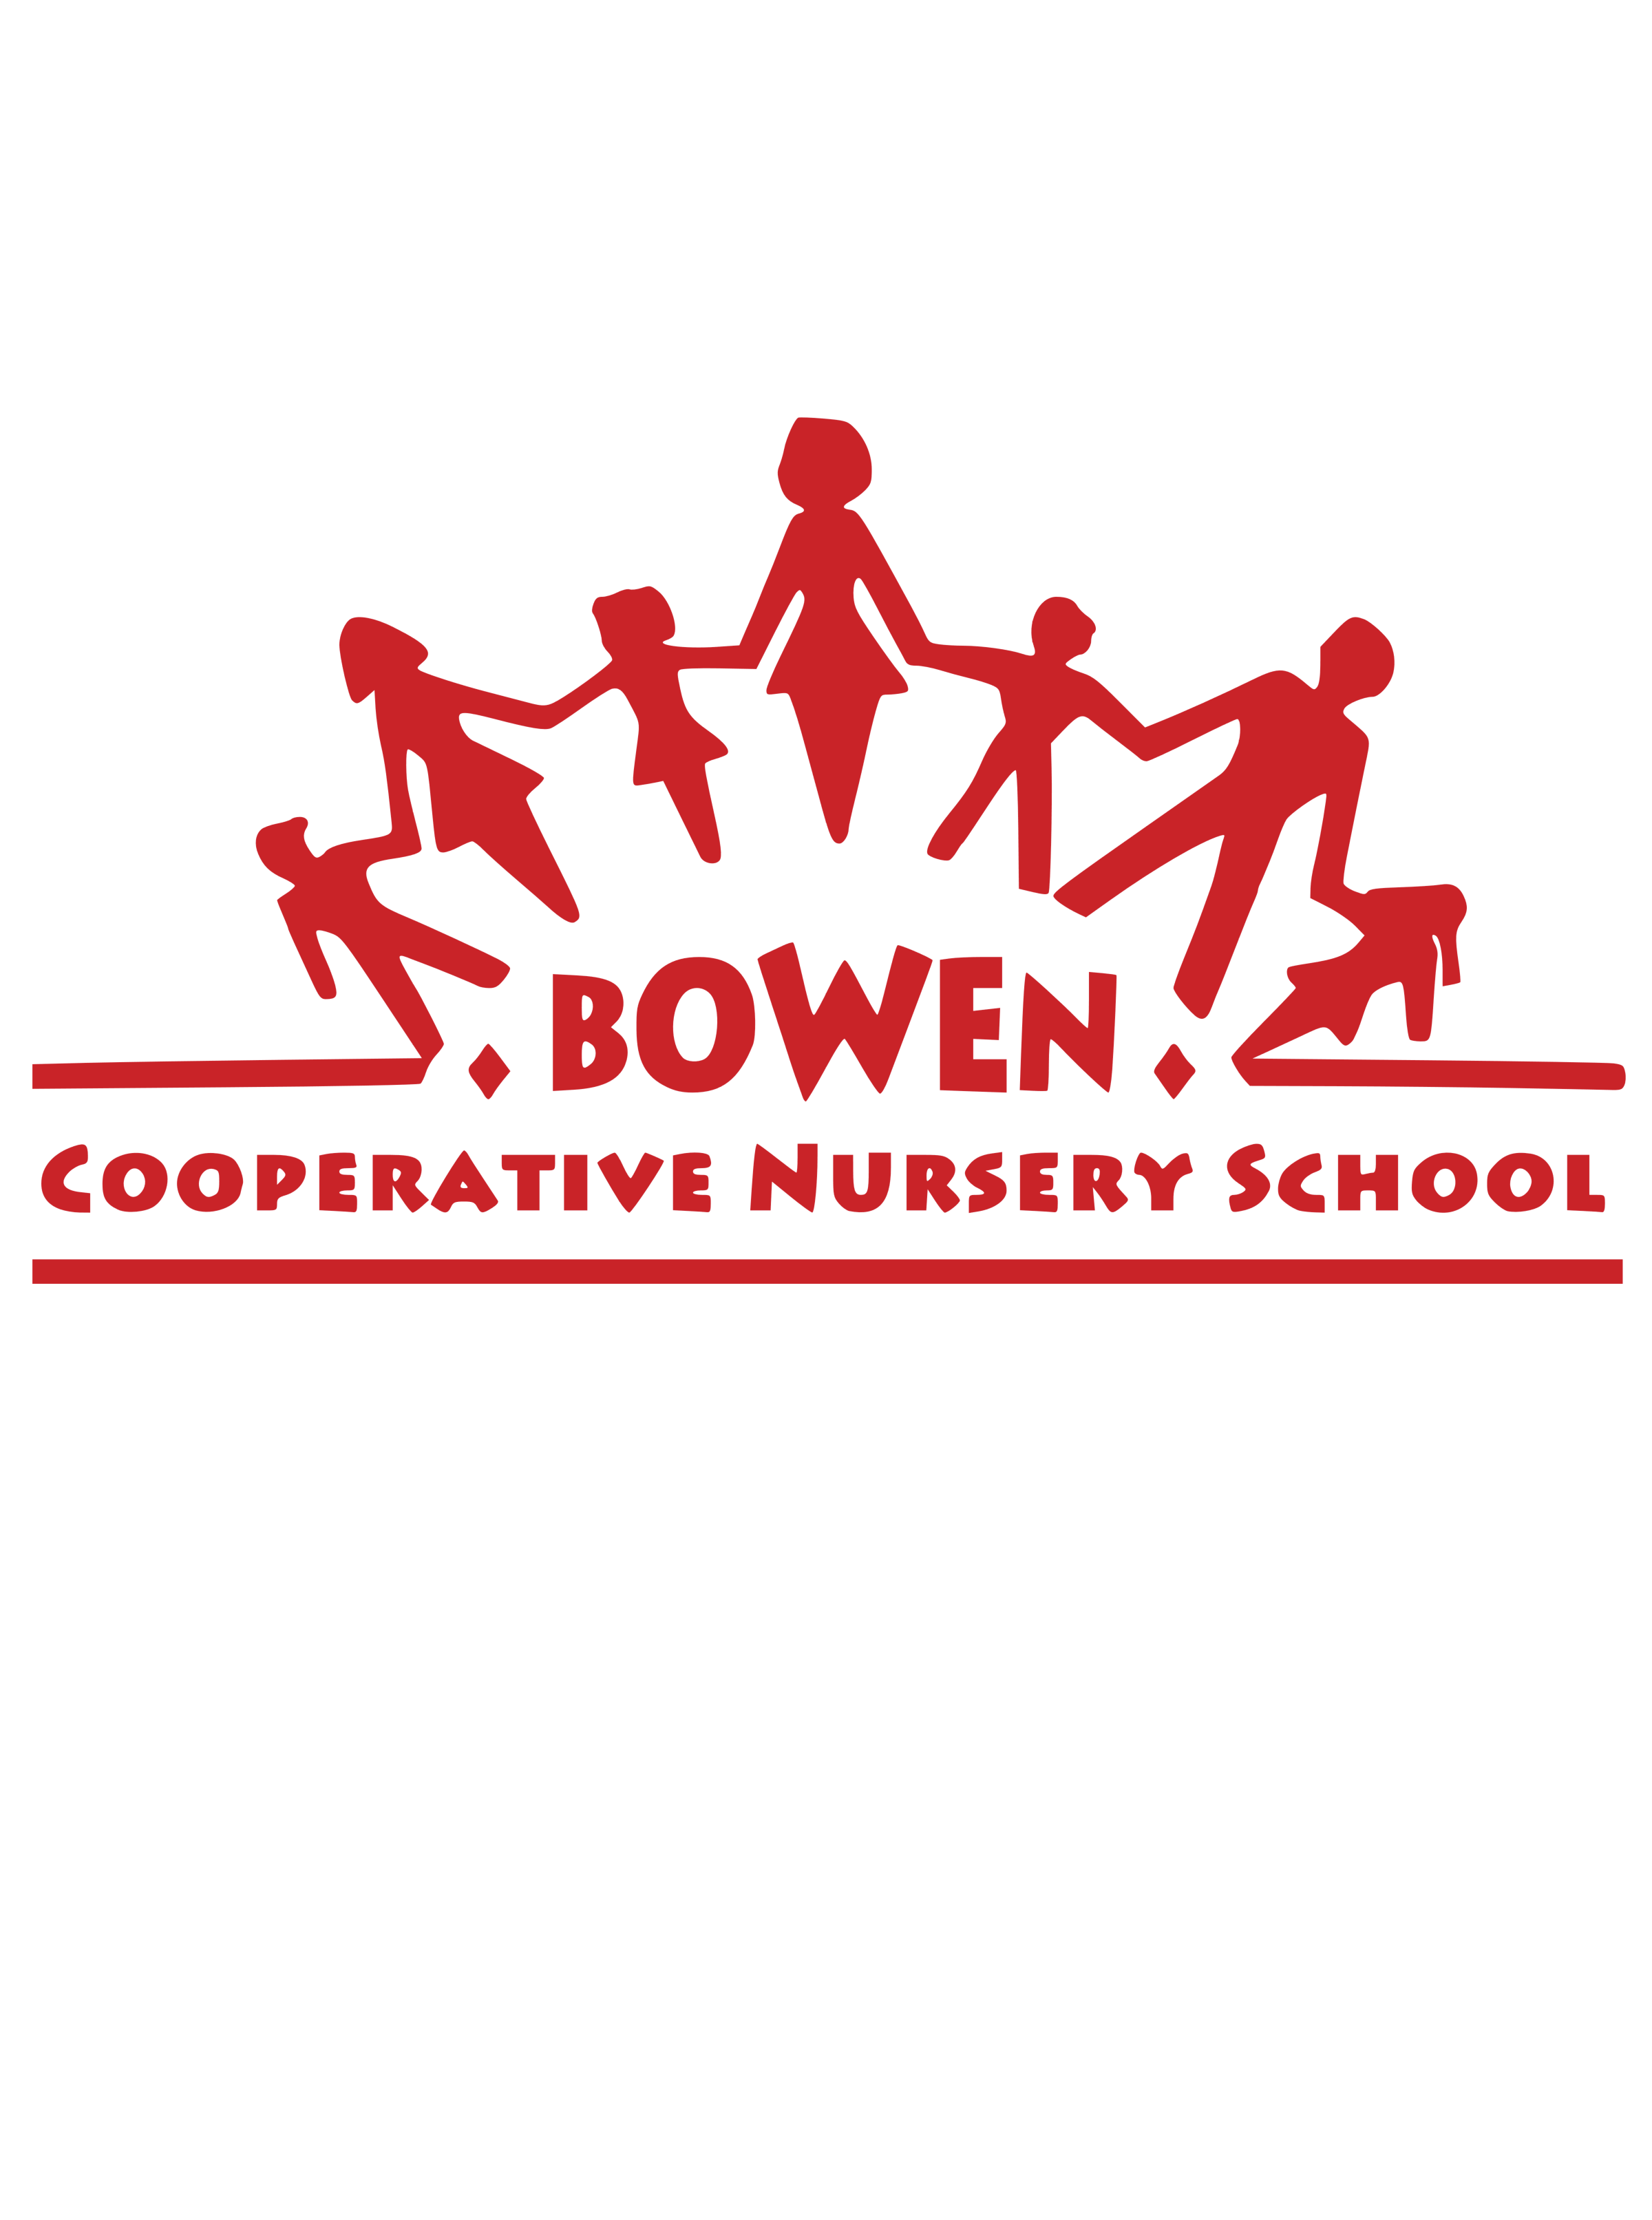 Bowen Cooperative Nursery School Fall Fete Silent Auction